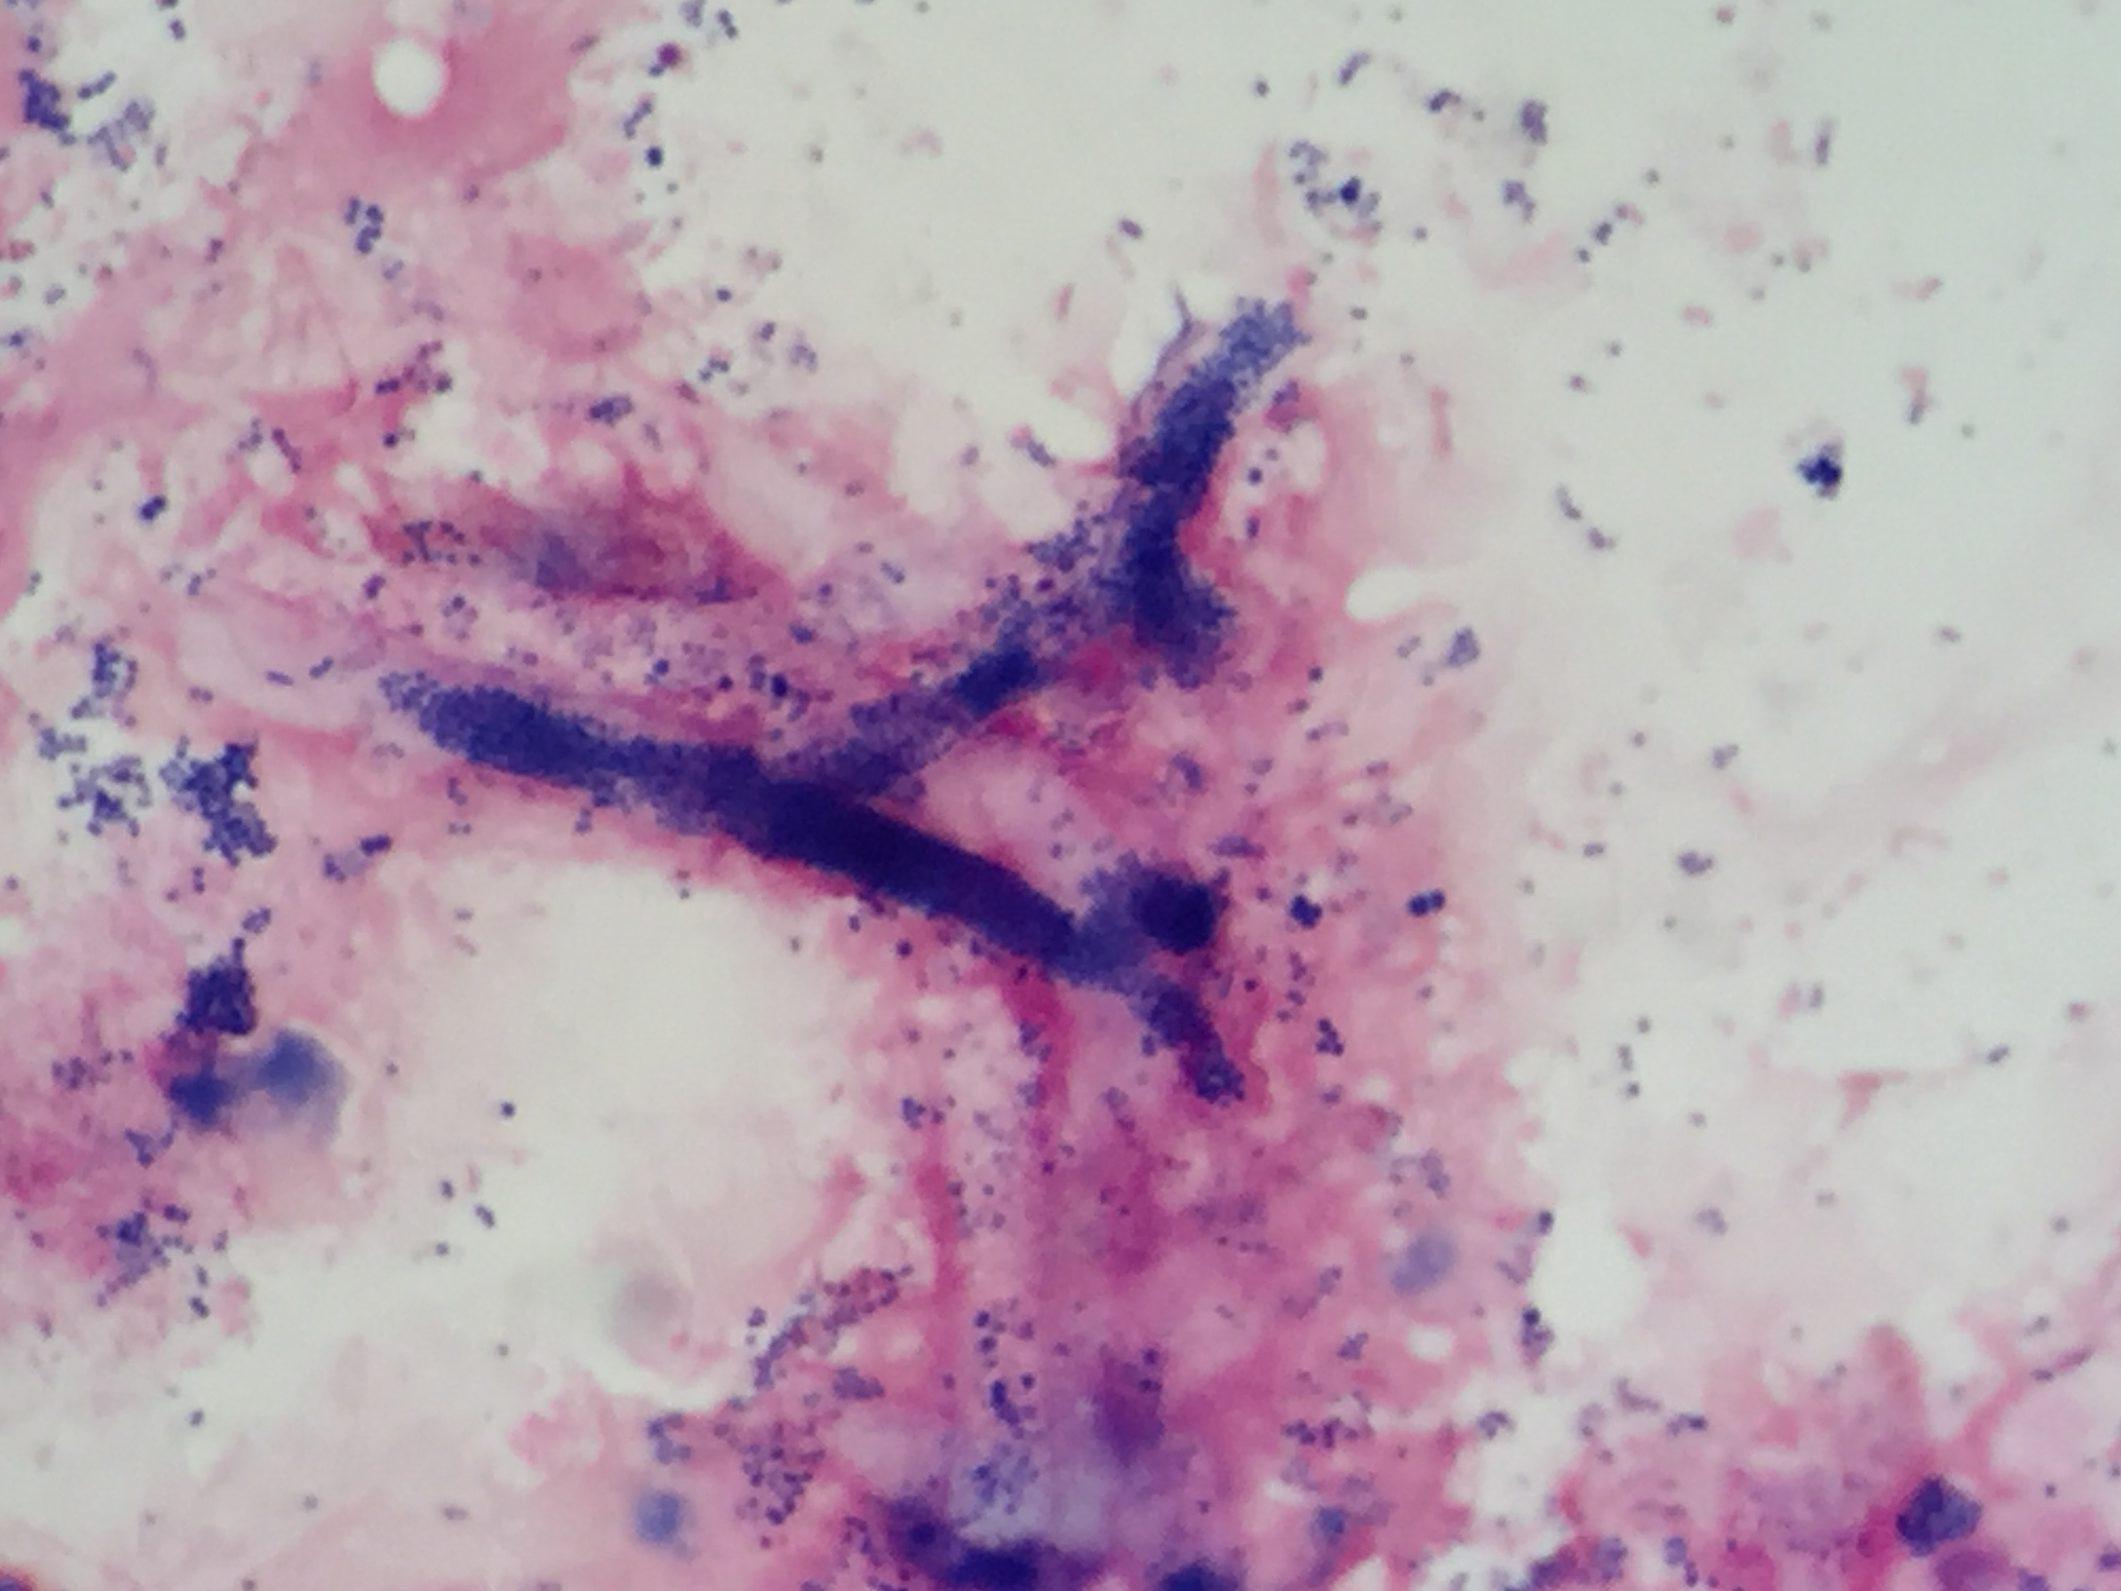 Aspergillus flavus〔アスペルギルス〕